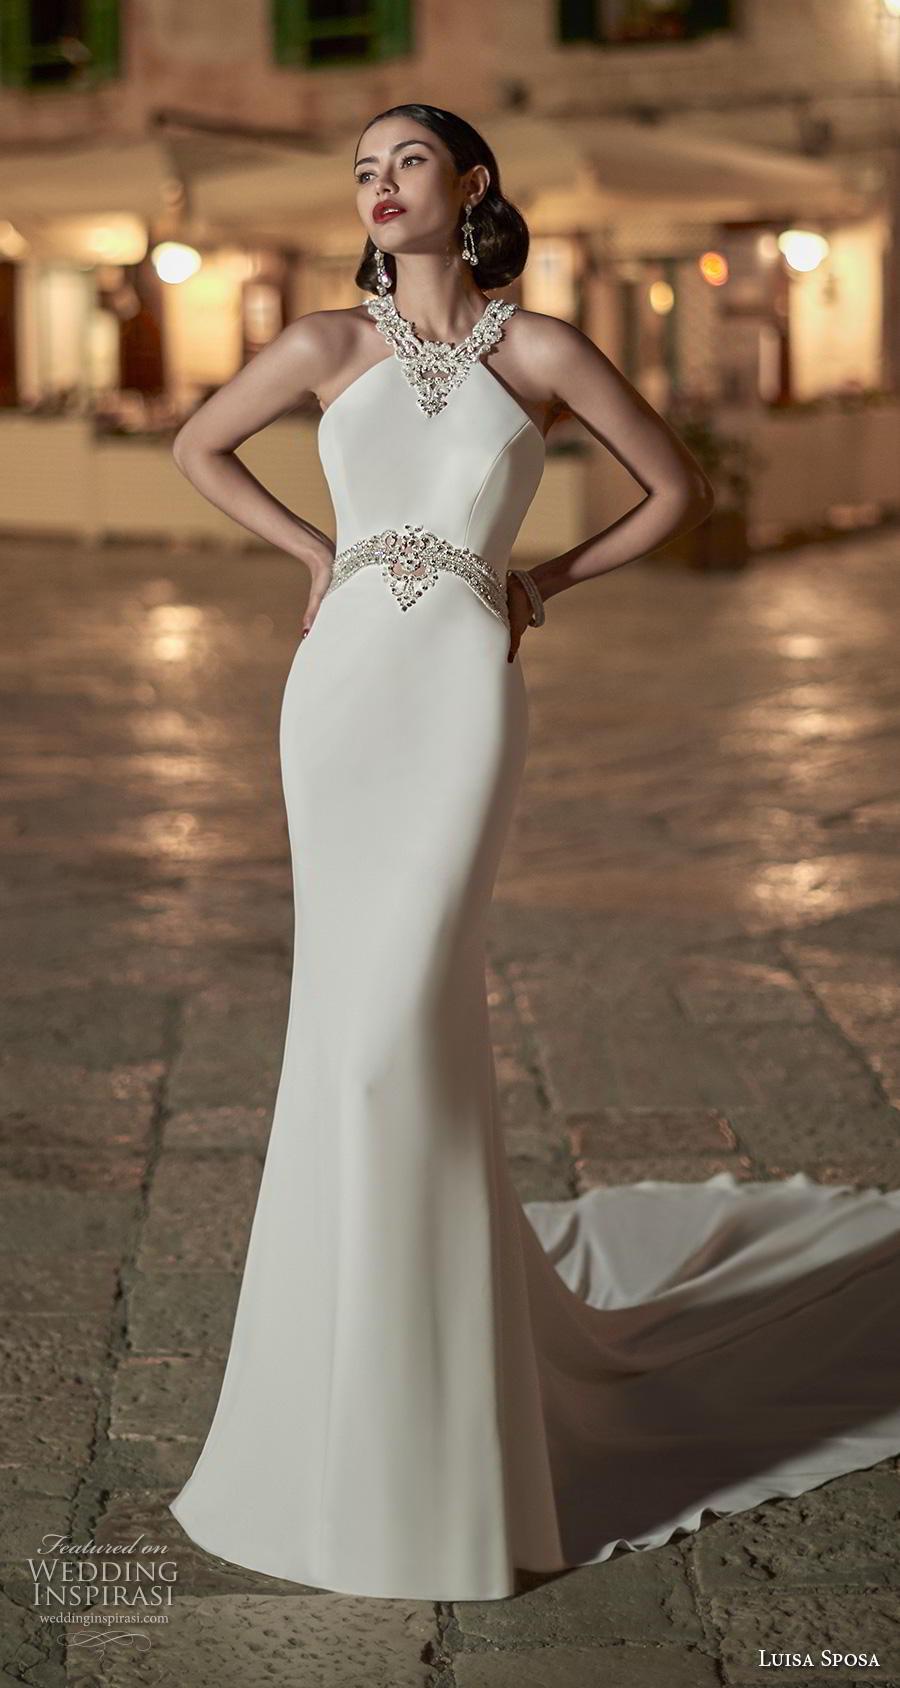 luisa sposa 2020 bridal sleeveless halter neck simple elegant glamorous fit and flare sheath wedding dress strap back chapel train (6) mv